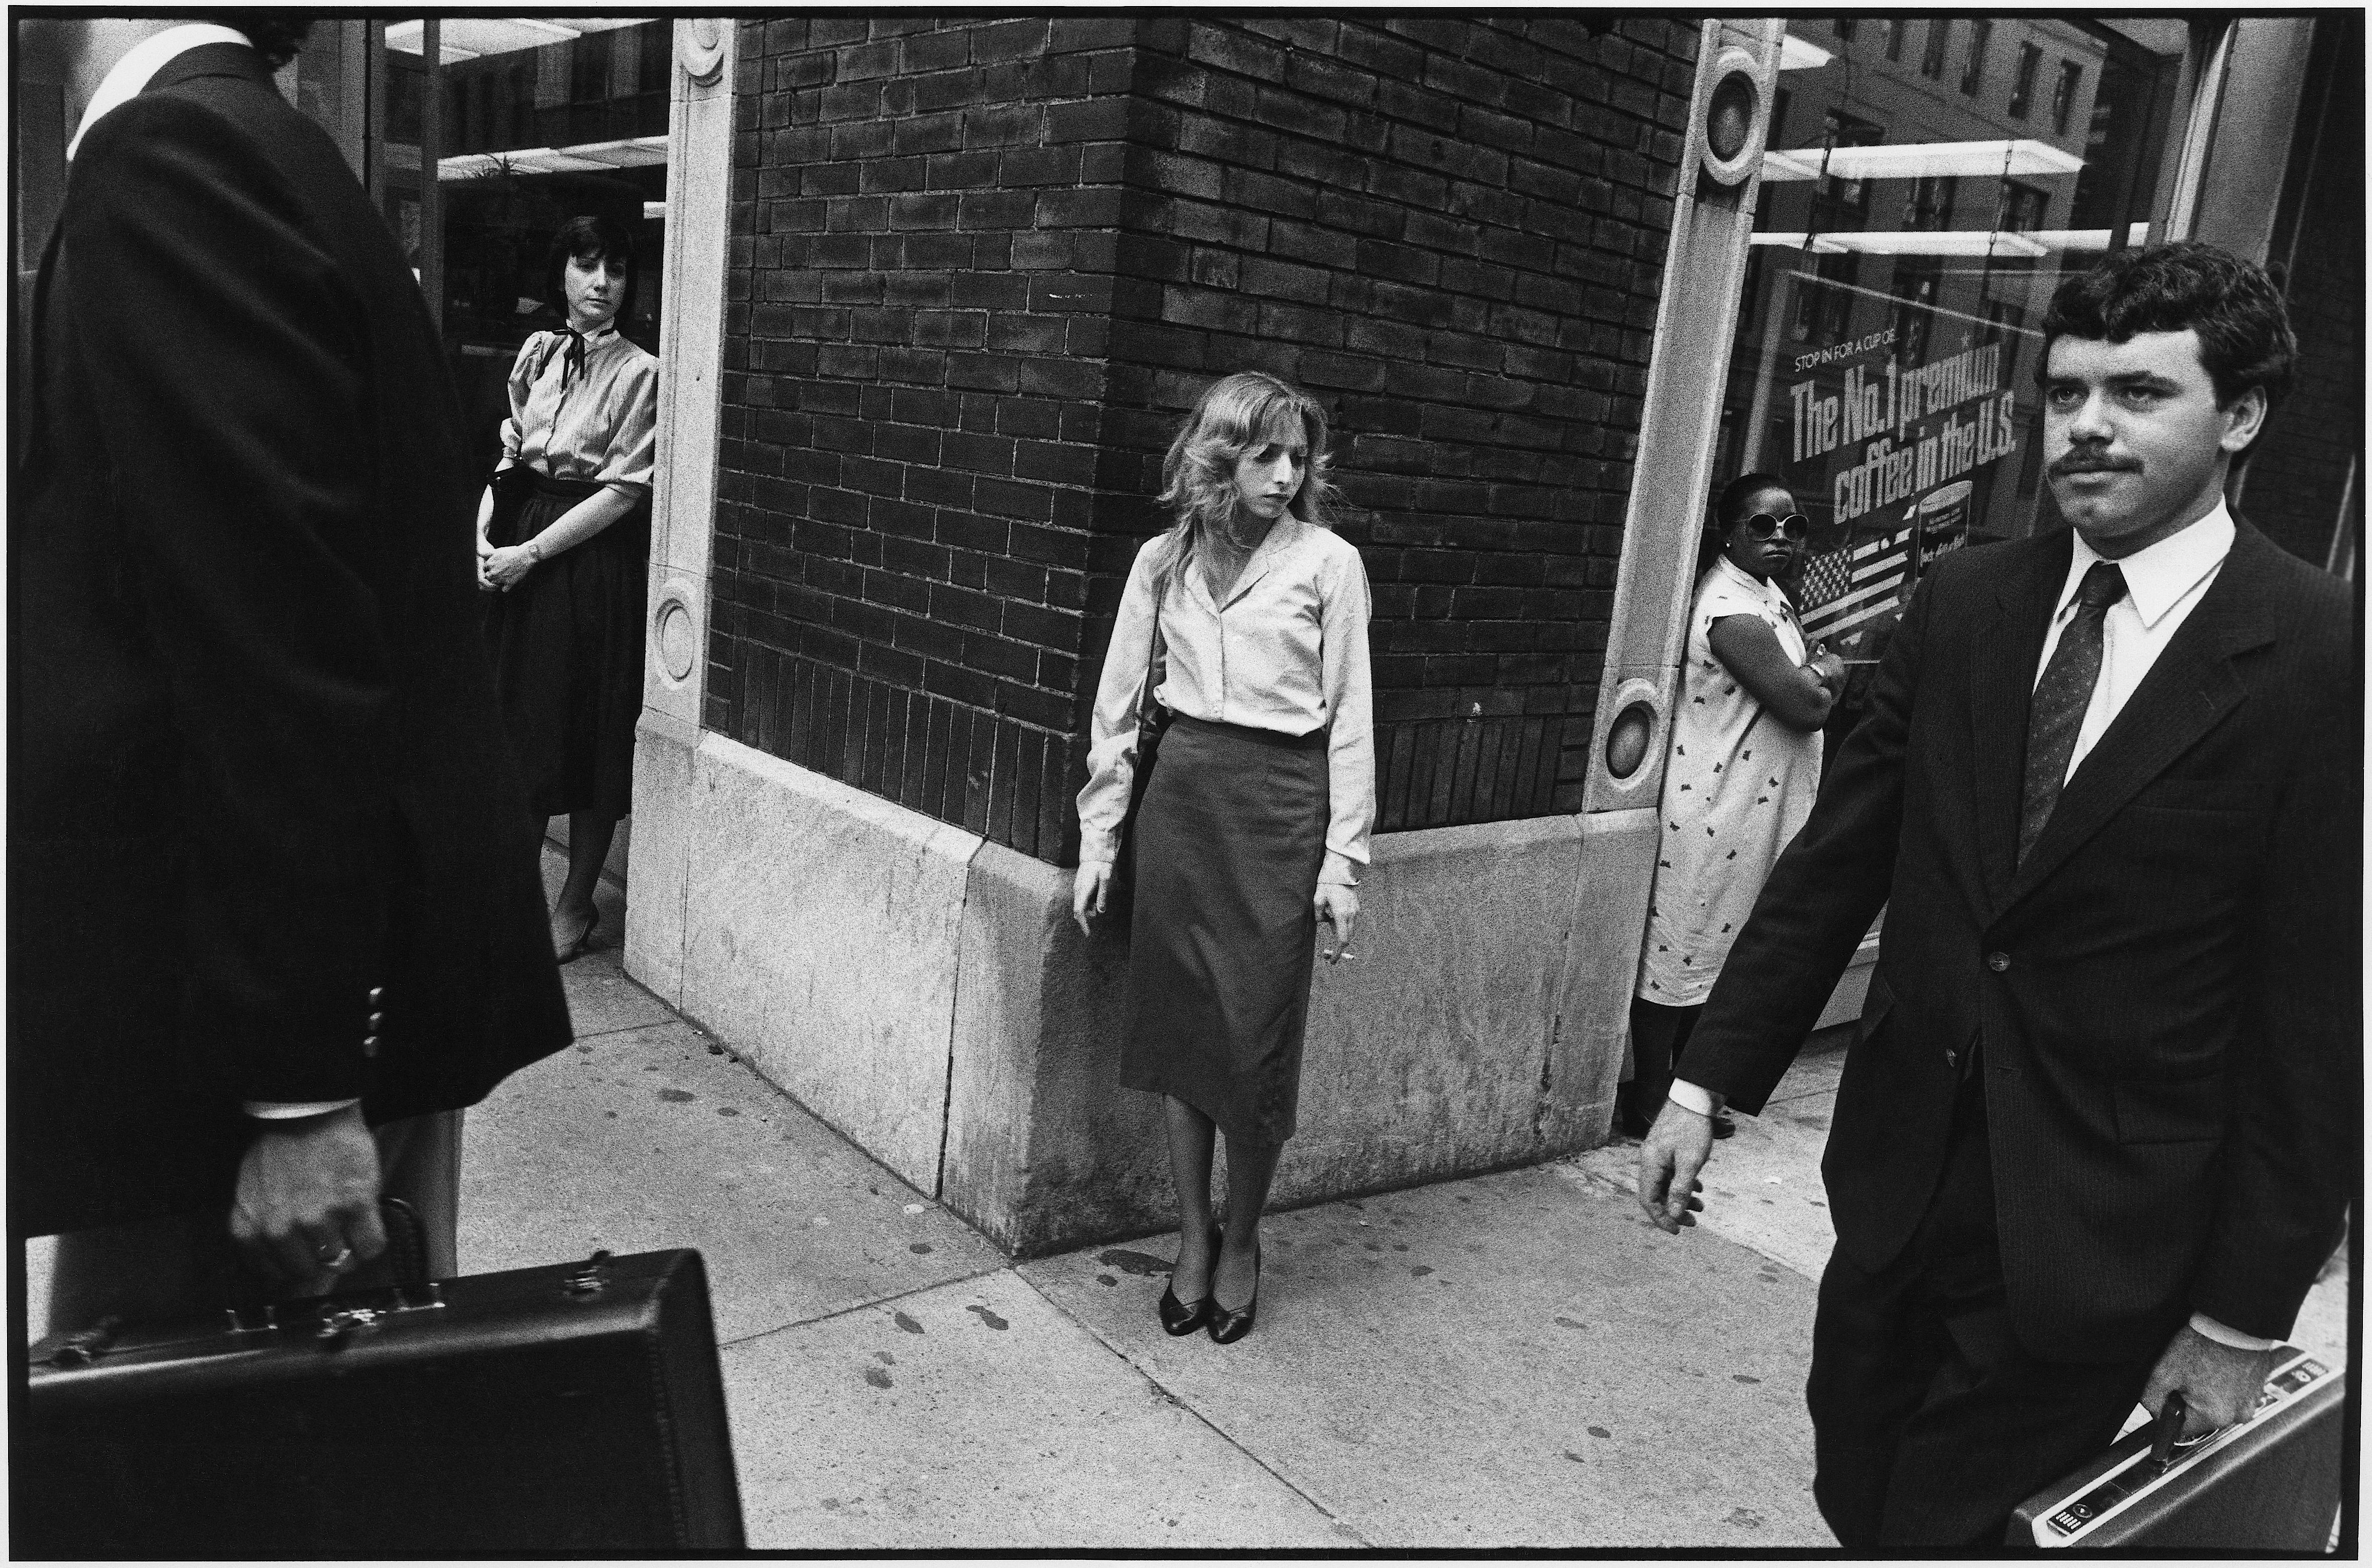 Madison Ave. and 32nd St., 1983 Richard Sandler Photography